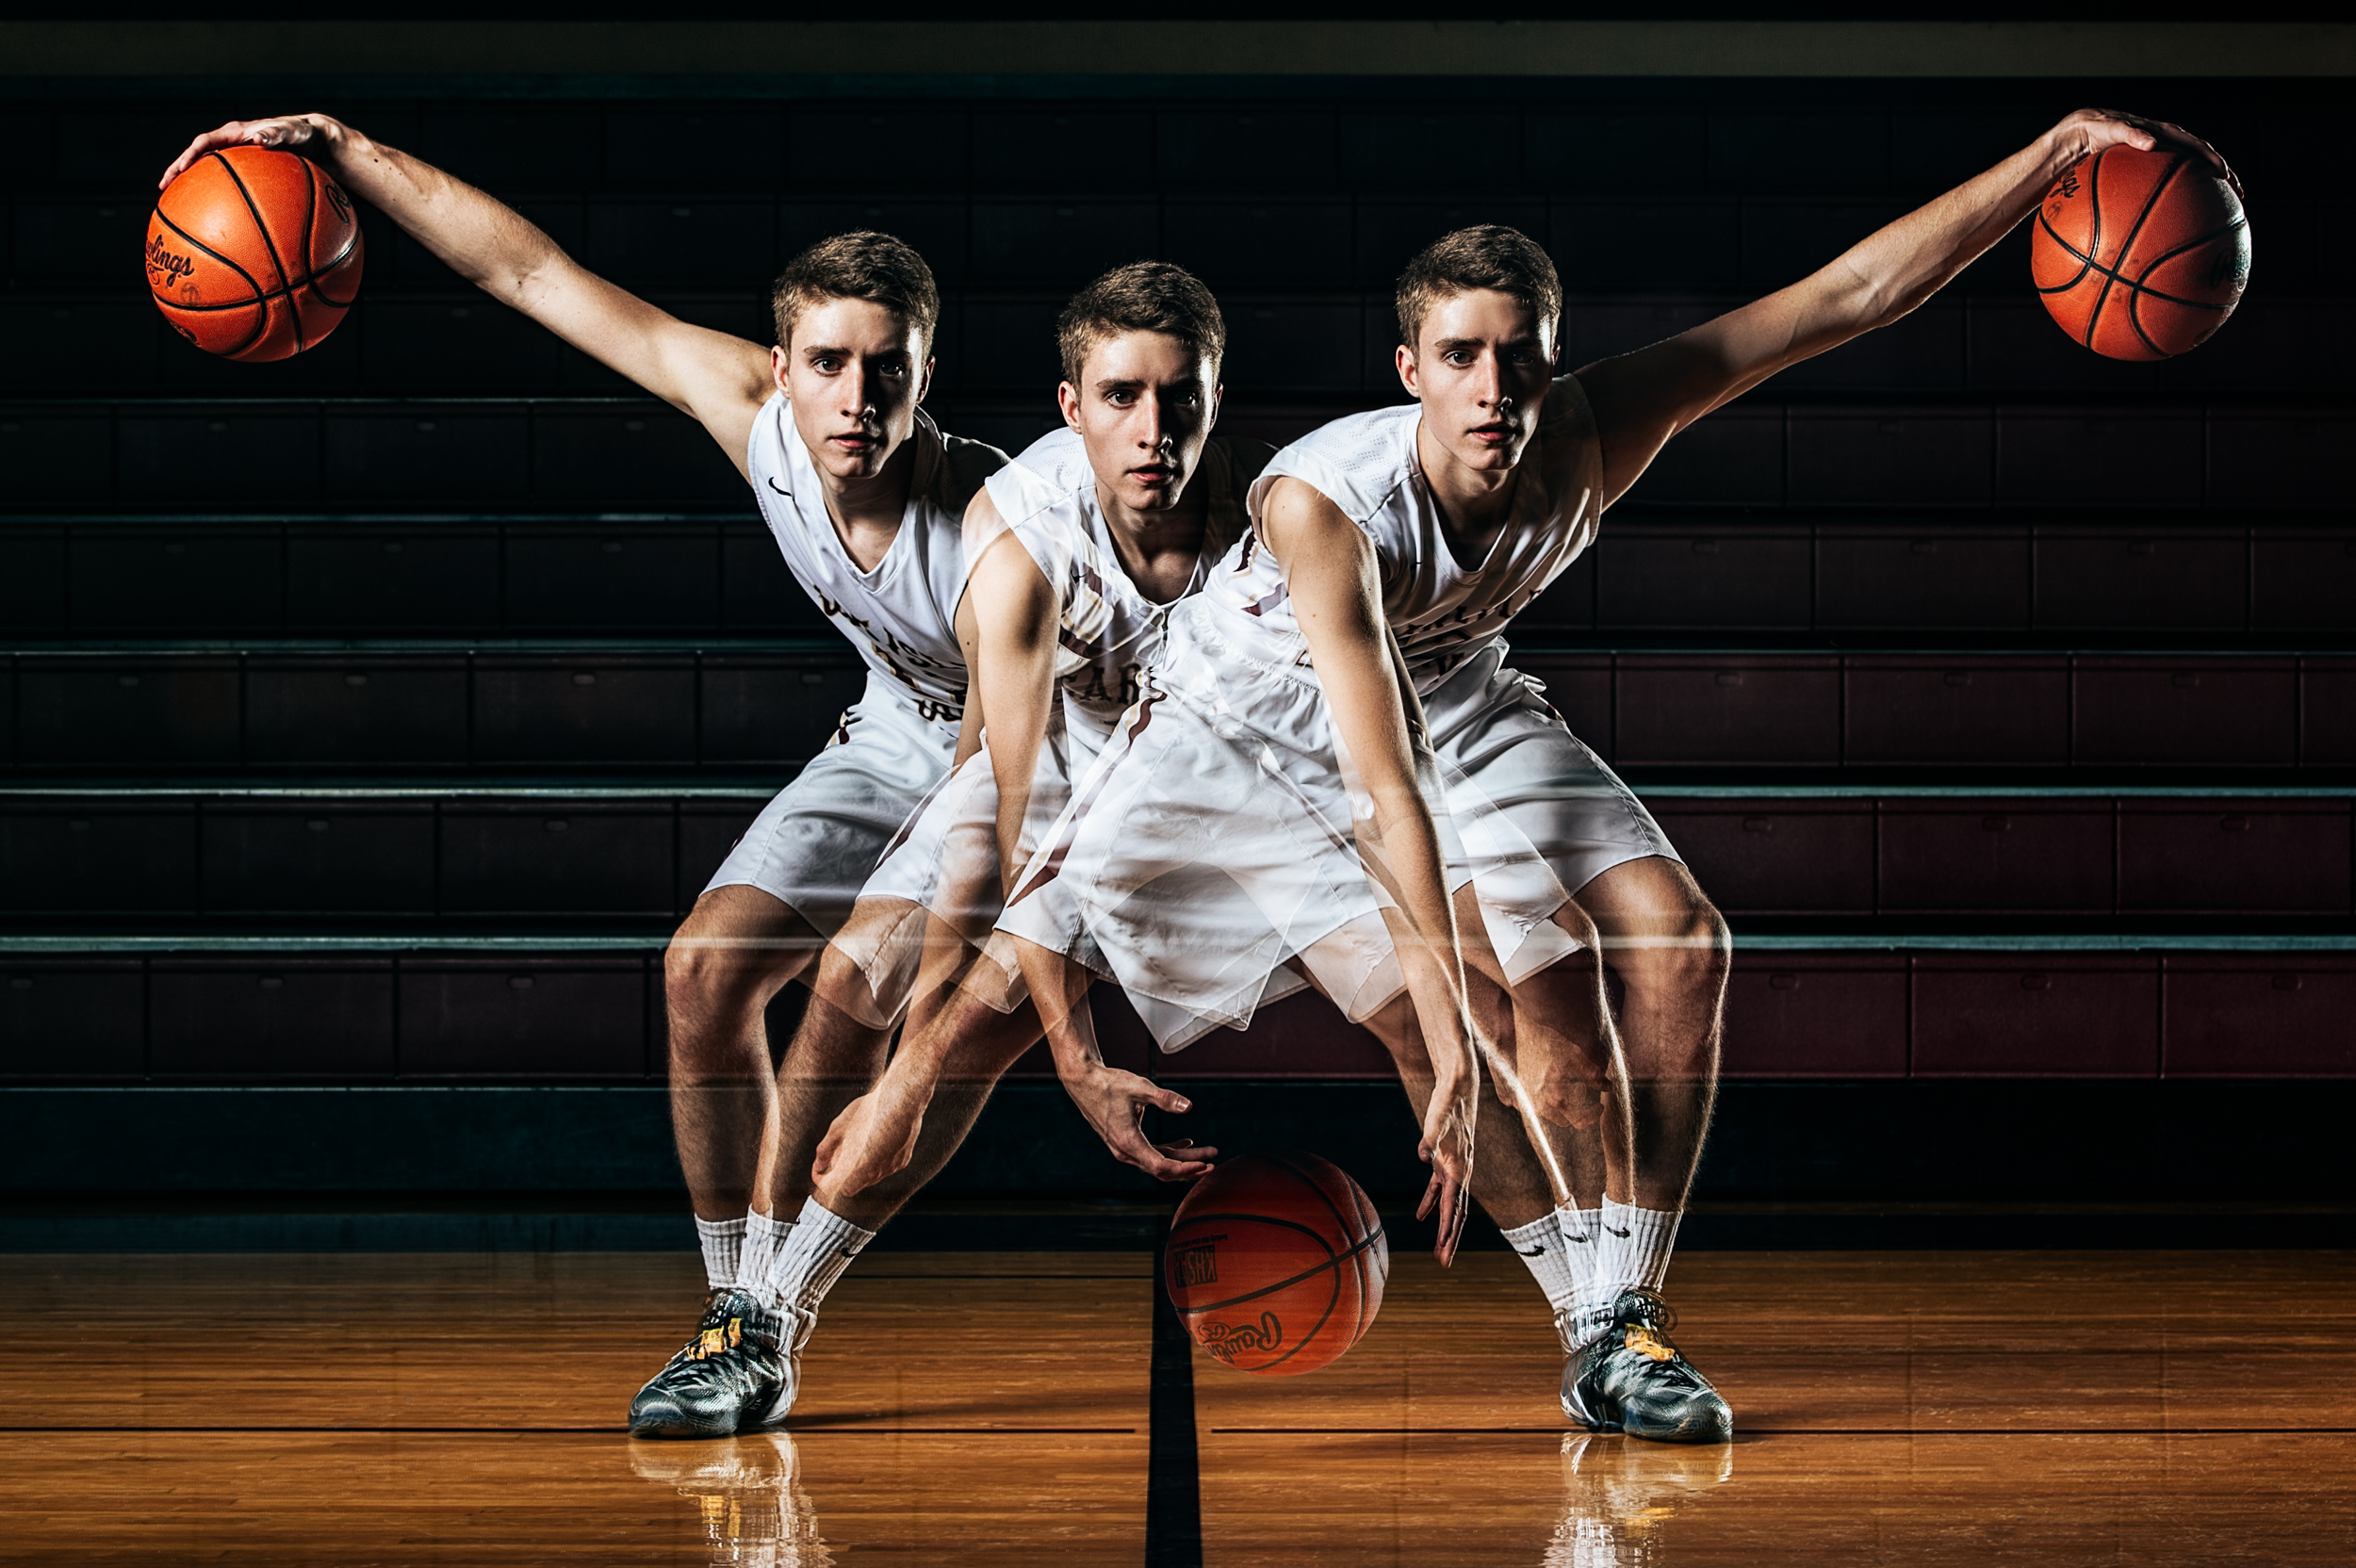 Noah Norsworthy, Jordan Kellett, & Paxton Crider Basketball Senior Pictures in Carlisle Co.